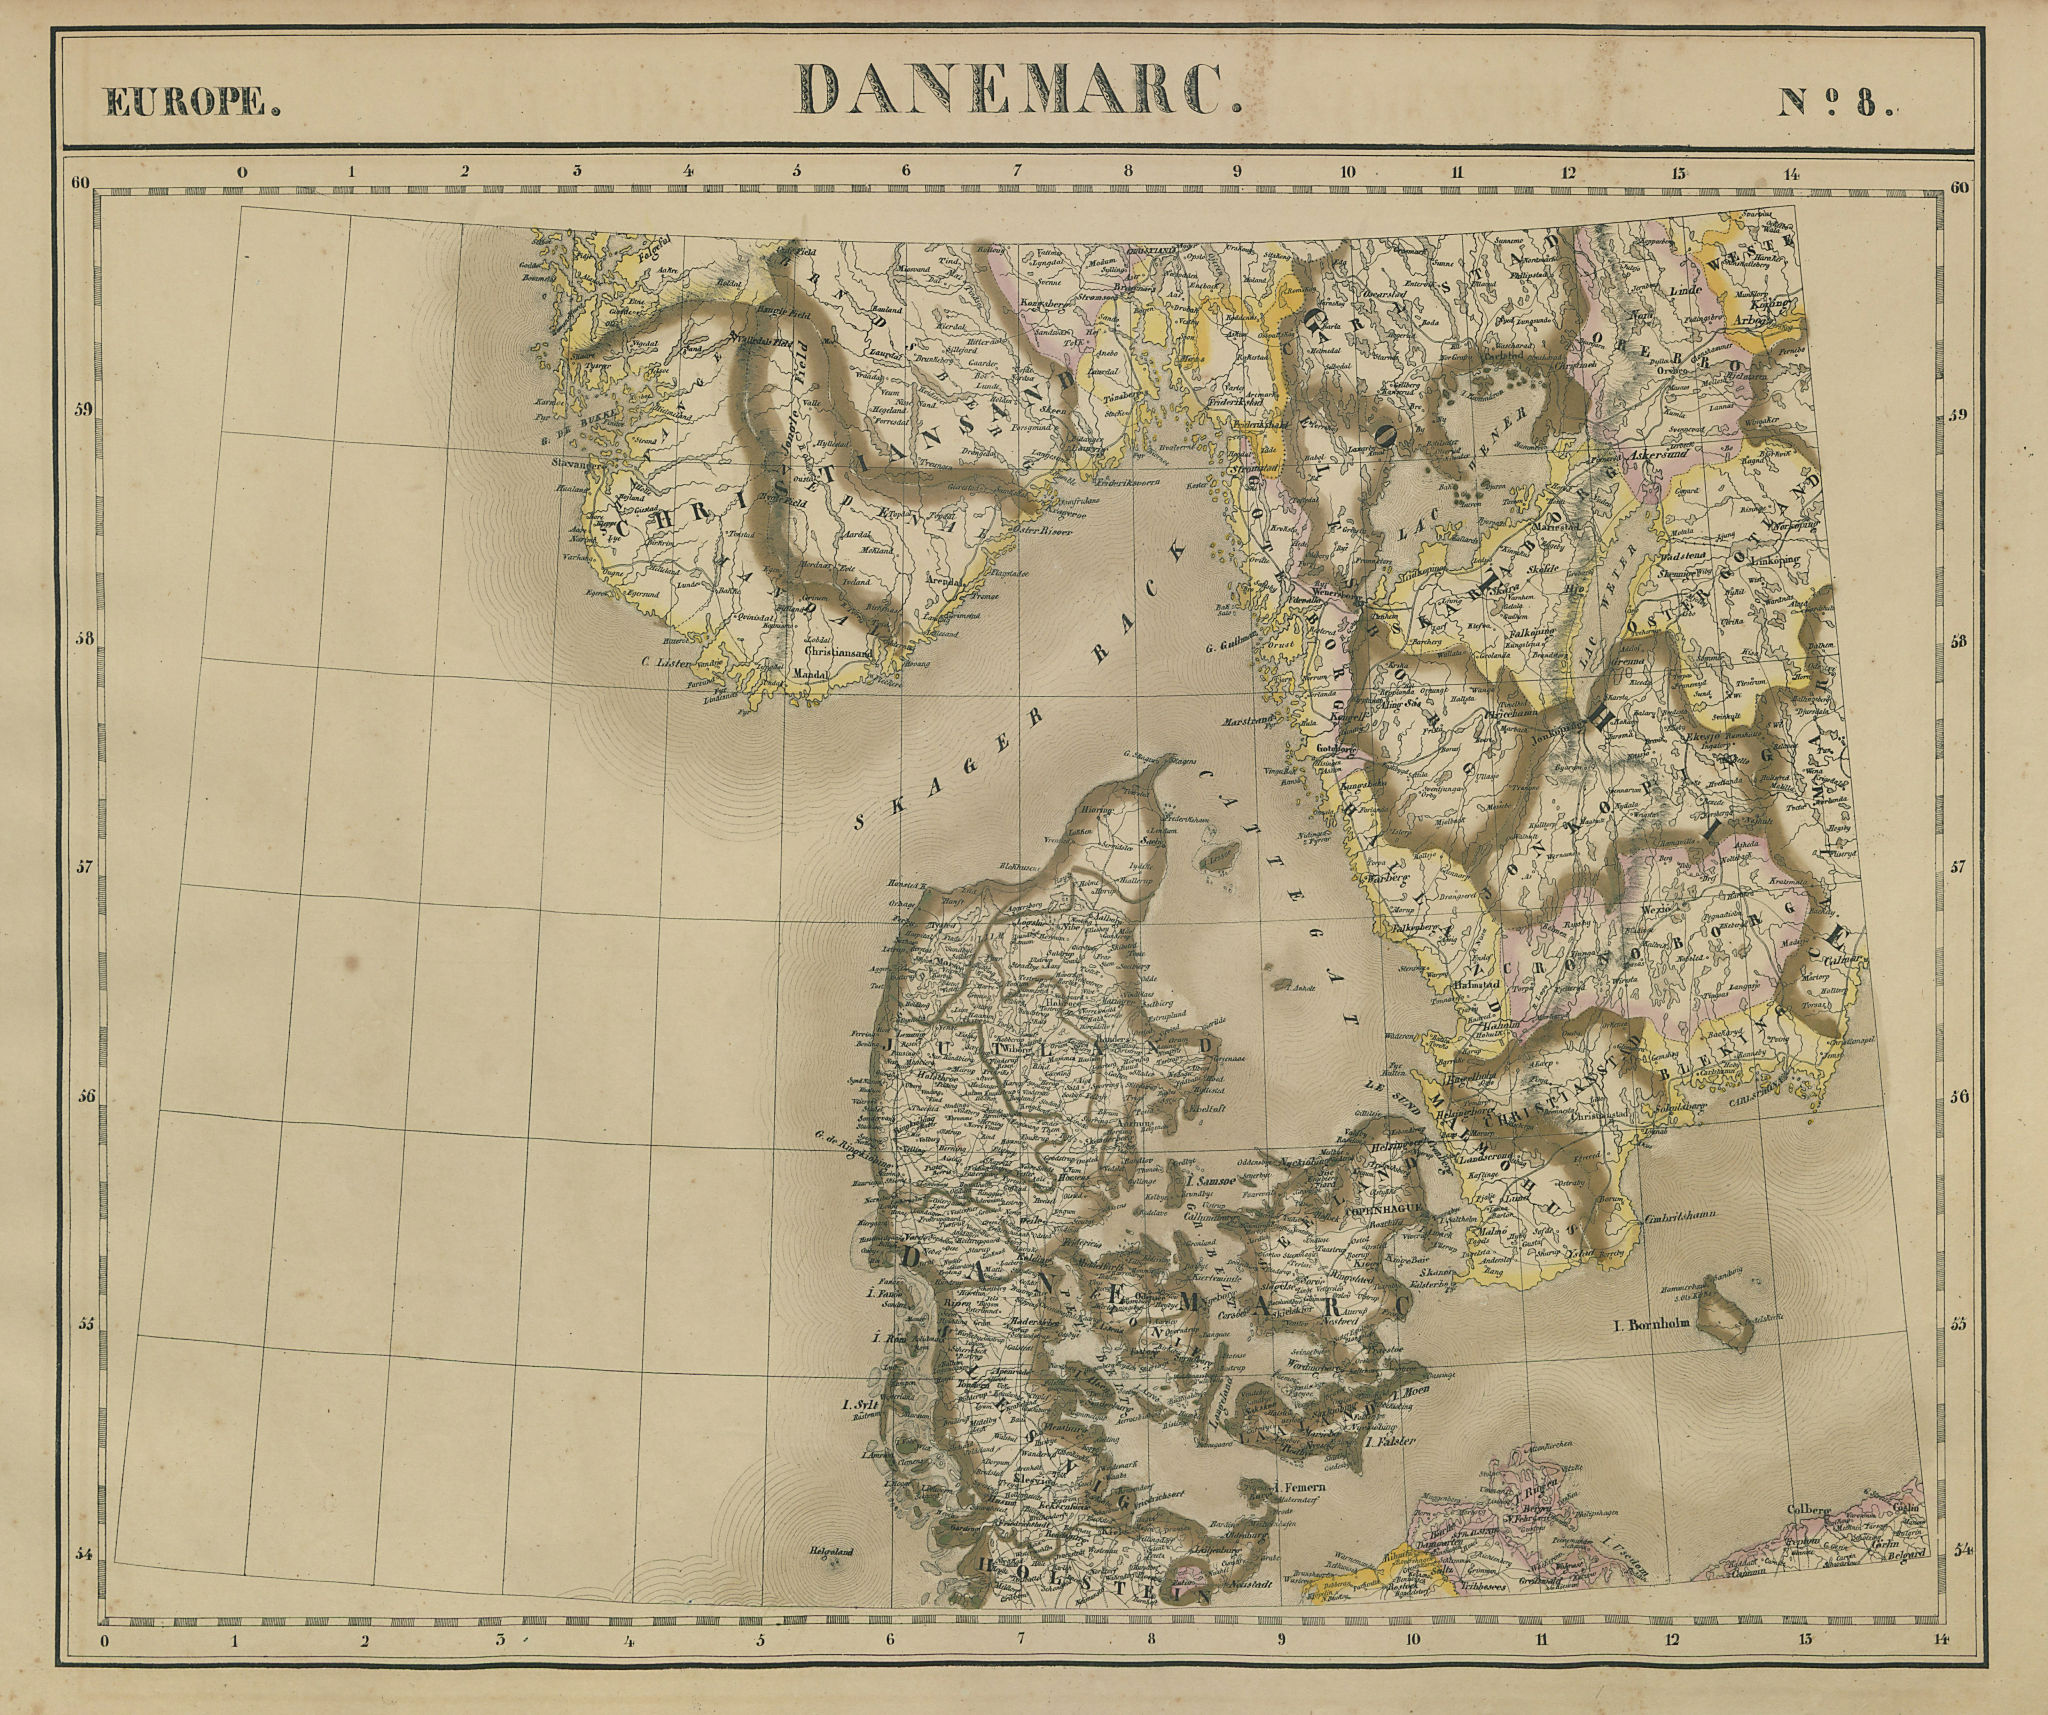 Europe. Danemarc #8 Denmark. Southern Sweden & Norway. VANDERMAELEN 1827 map